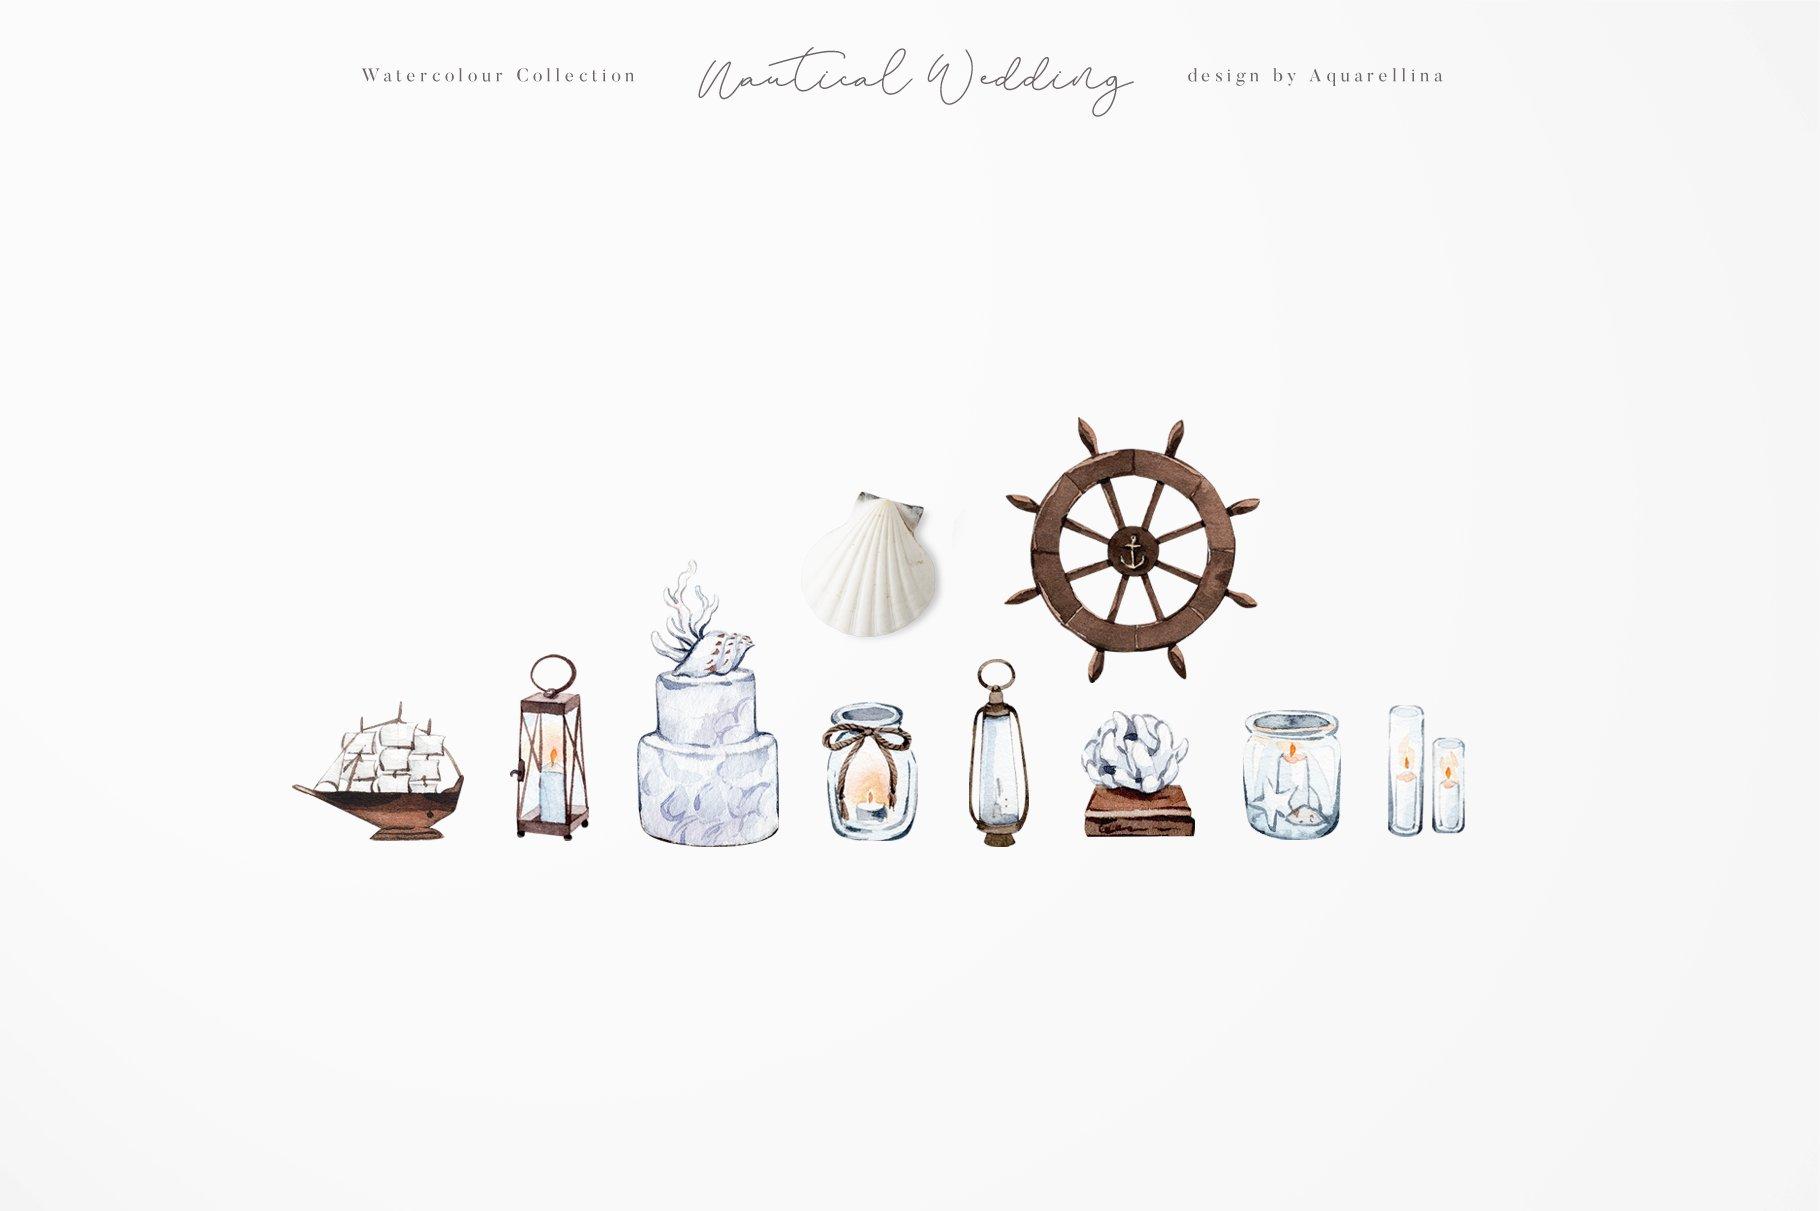 nautical beach wedding illustrations by aquarellina screenshot 10d 11